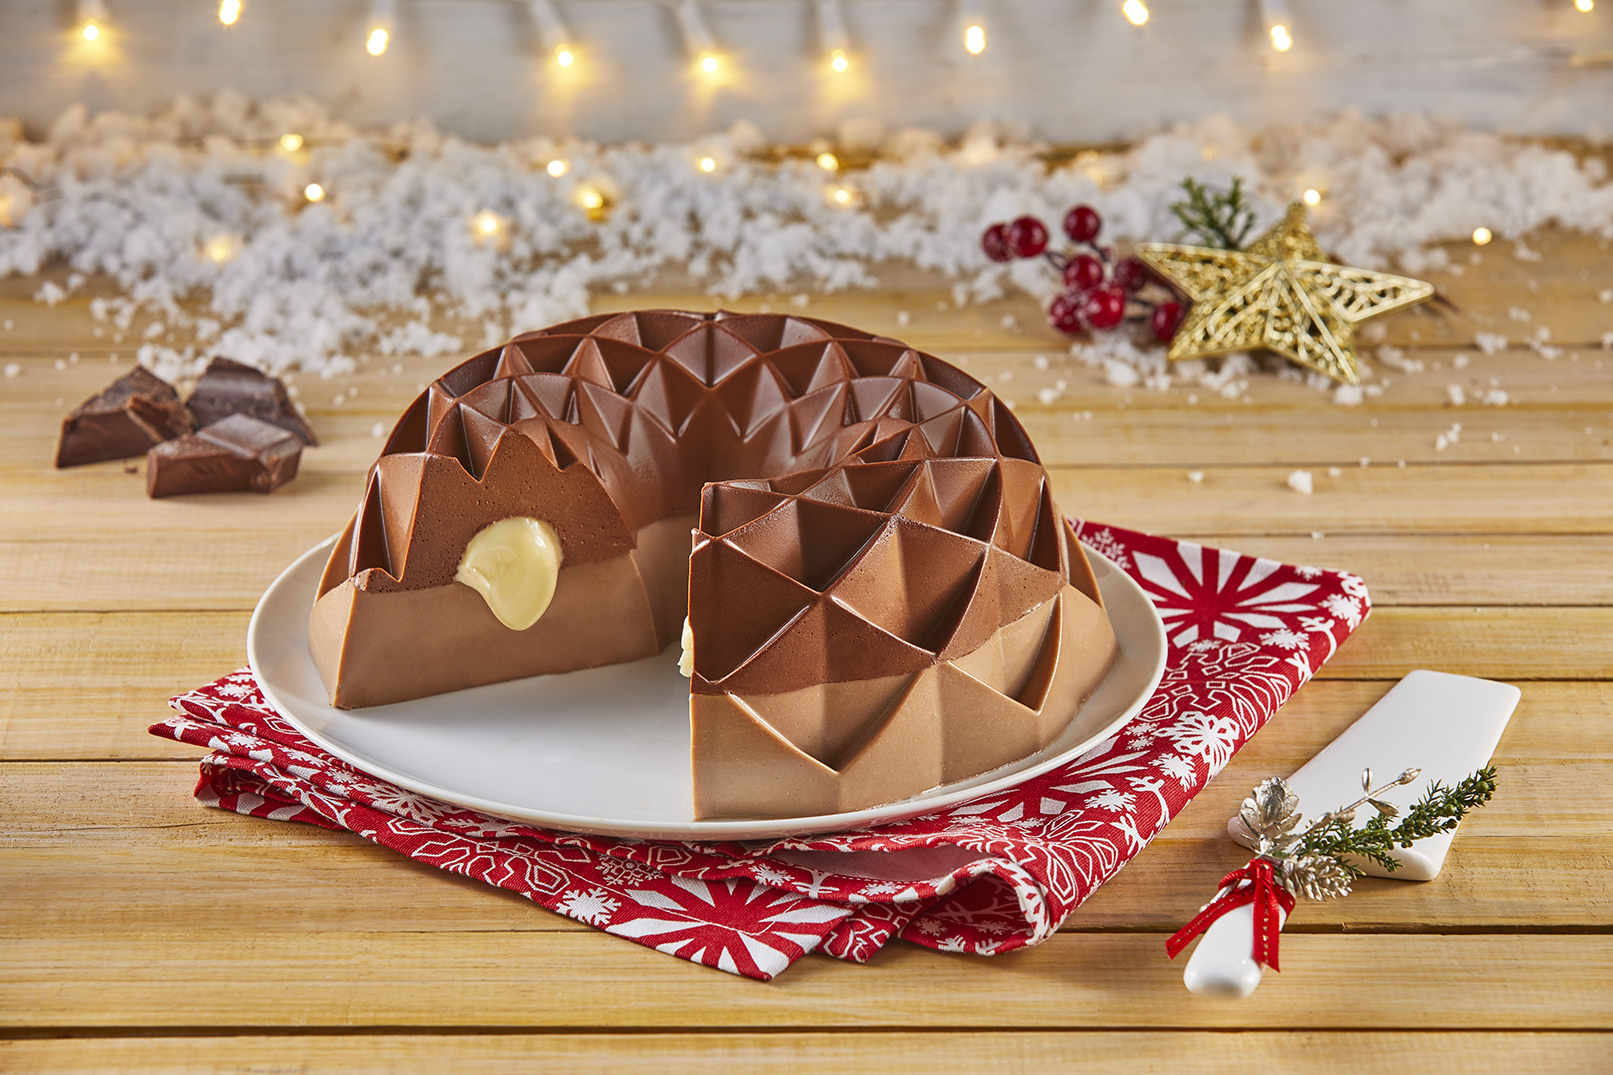 Gelatina rellena de tres chocolates